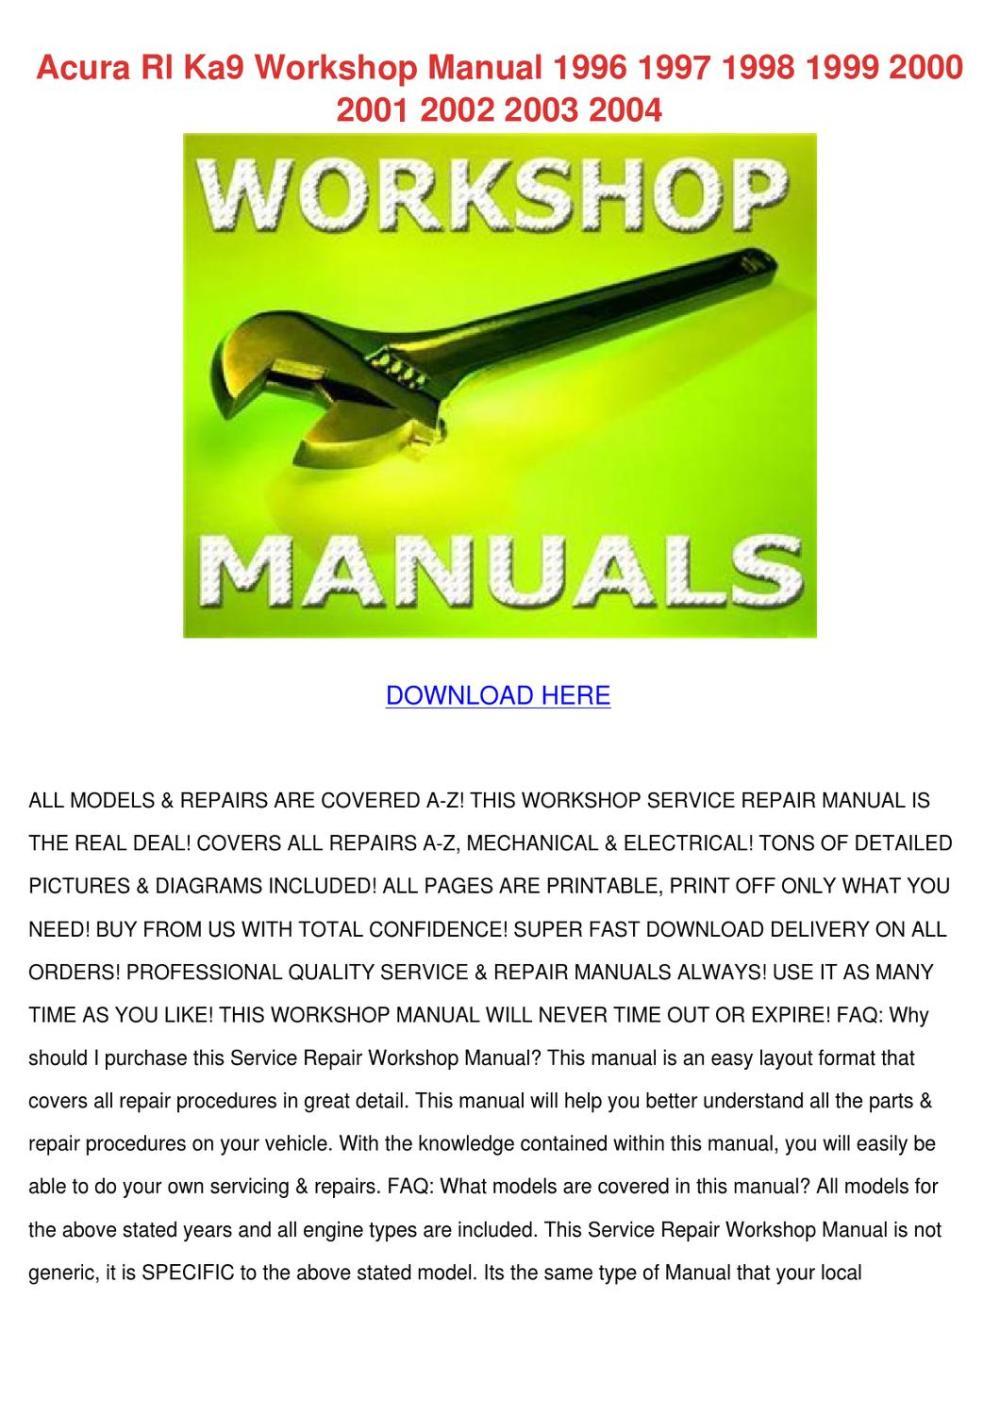 medium resolution of acura rl ka9 workshop manual 1996 1997 1998 1